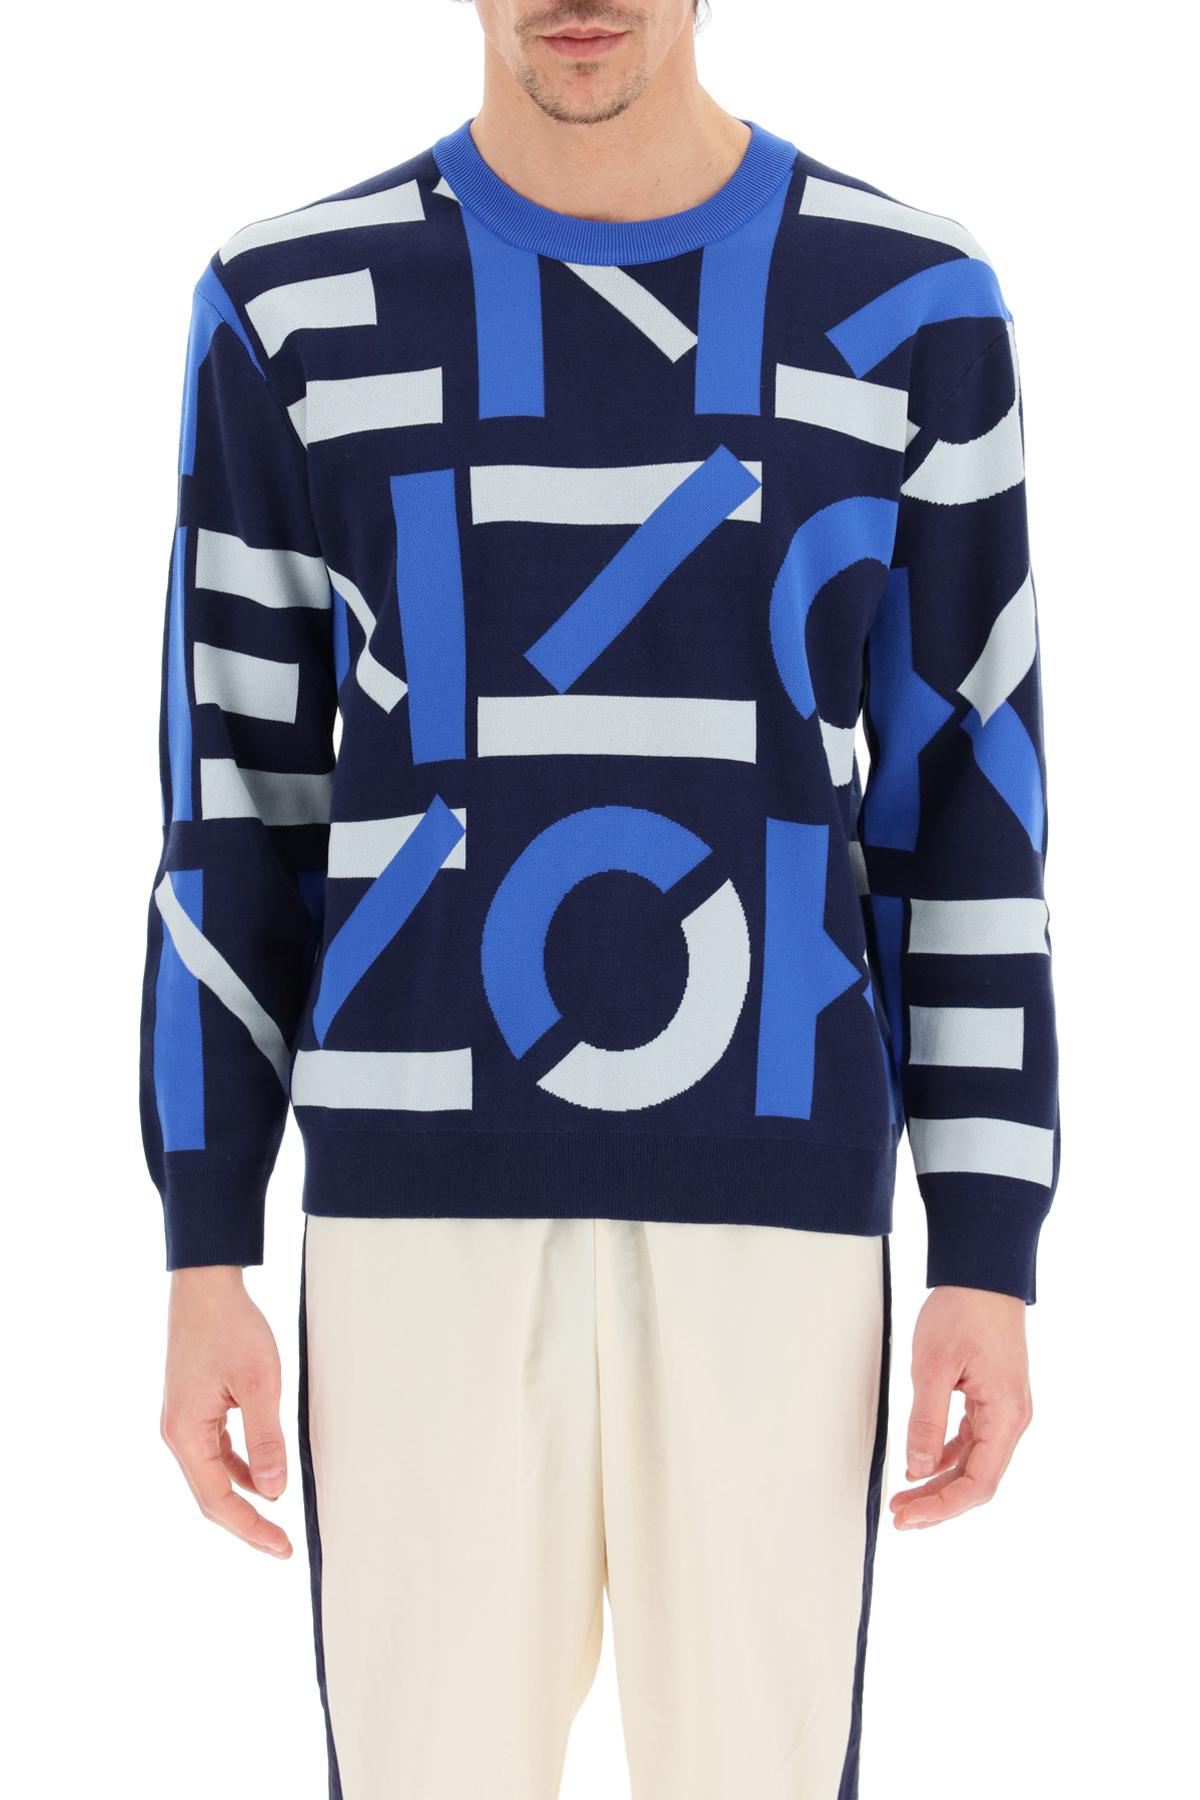 Kenzo pullover jacquard monogram